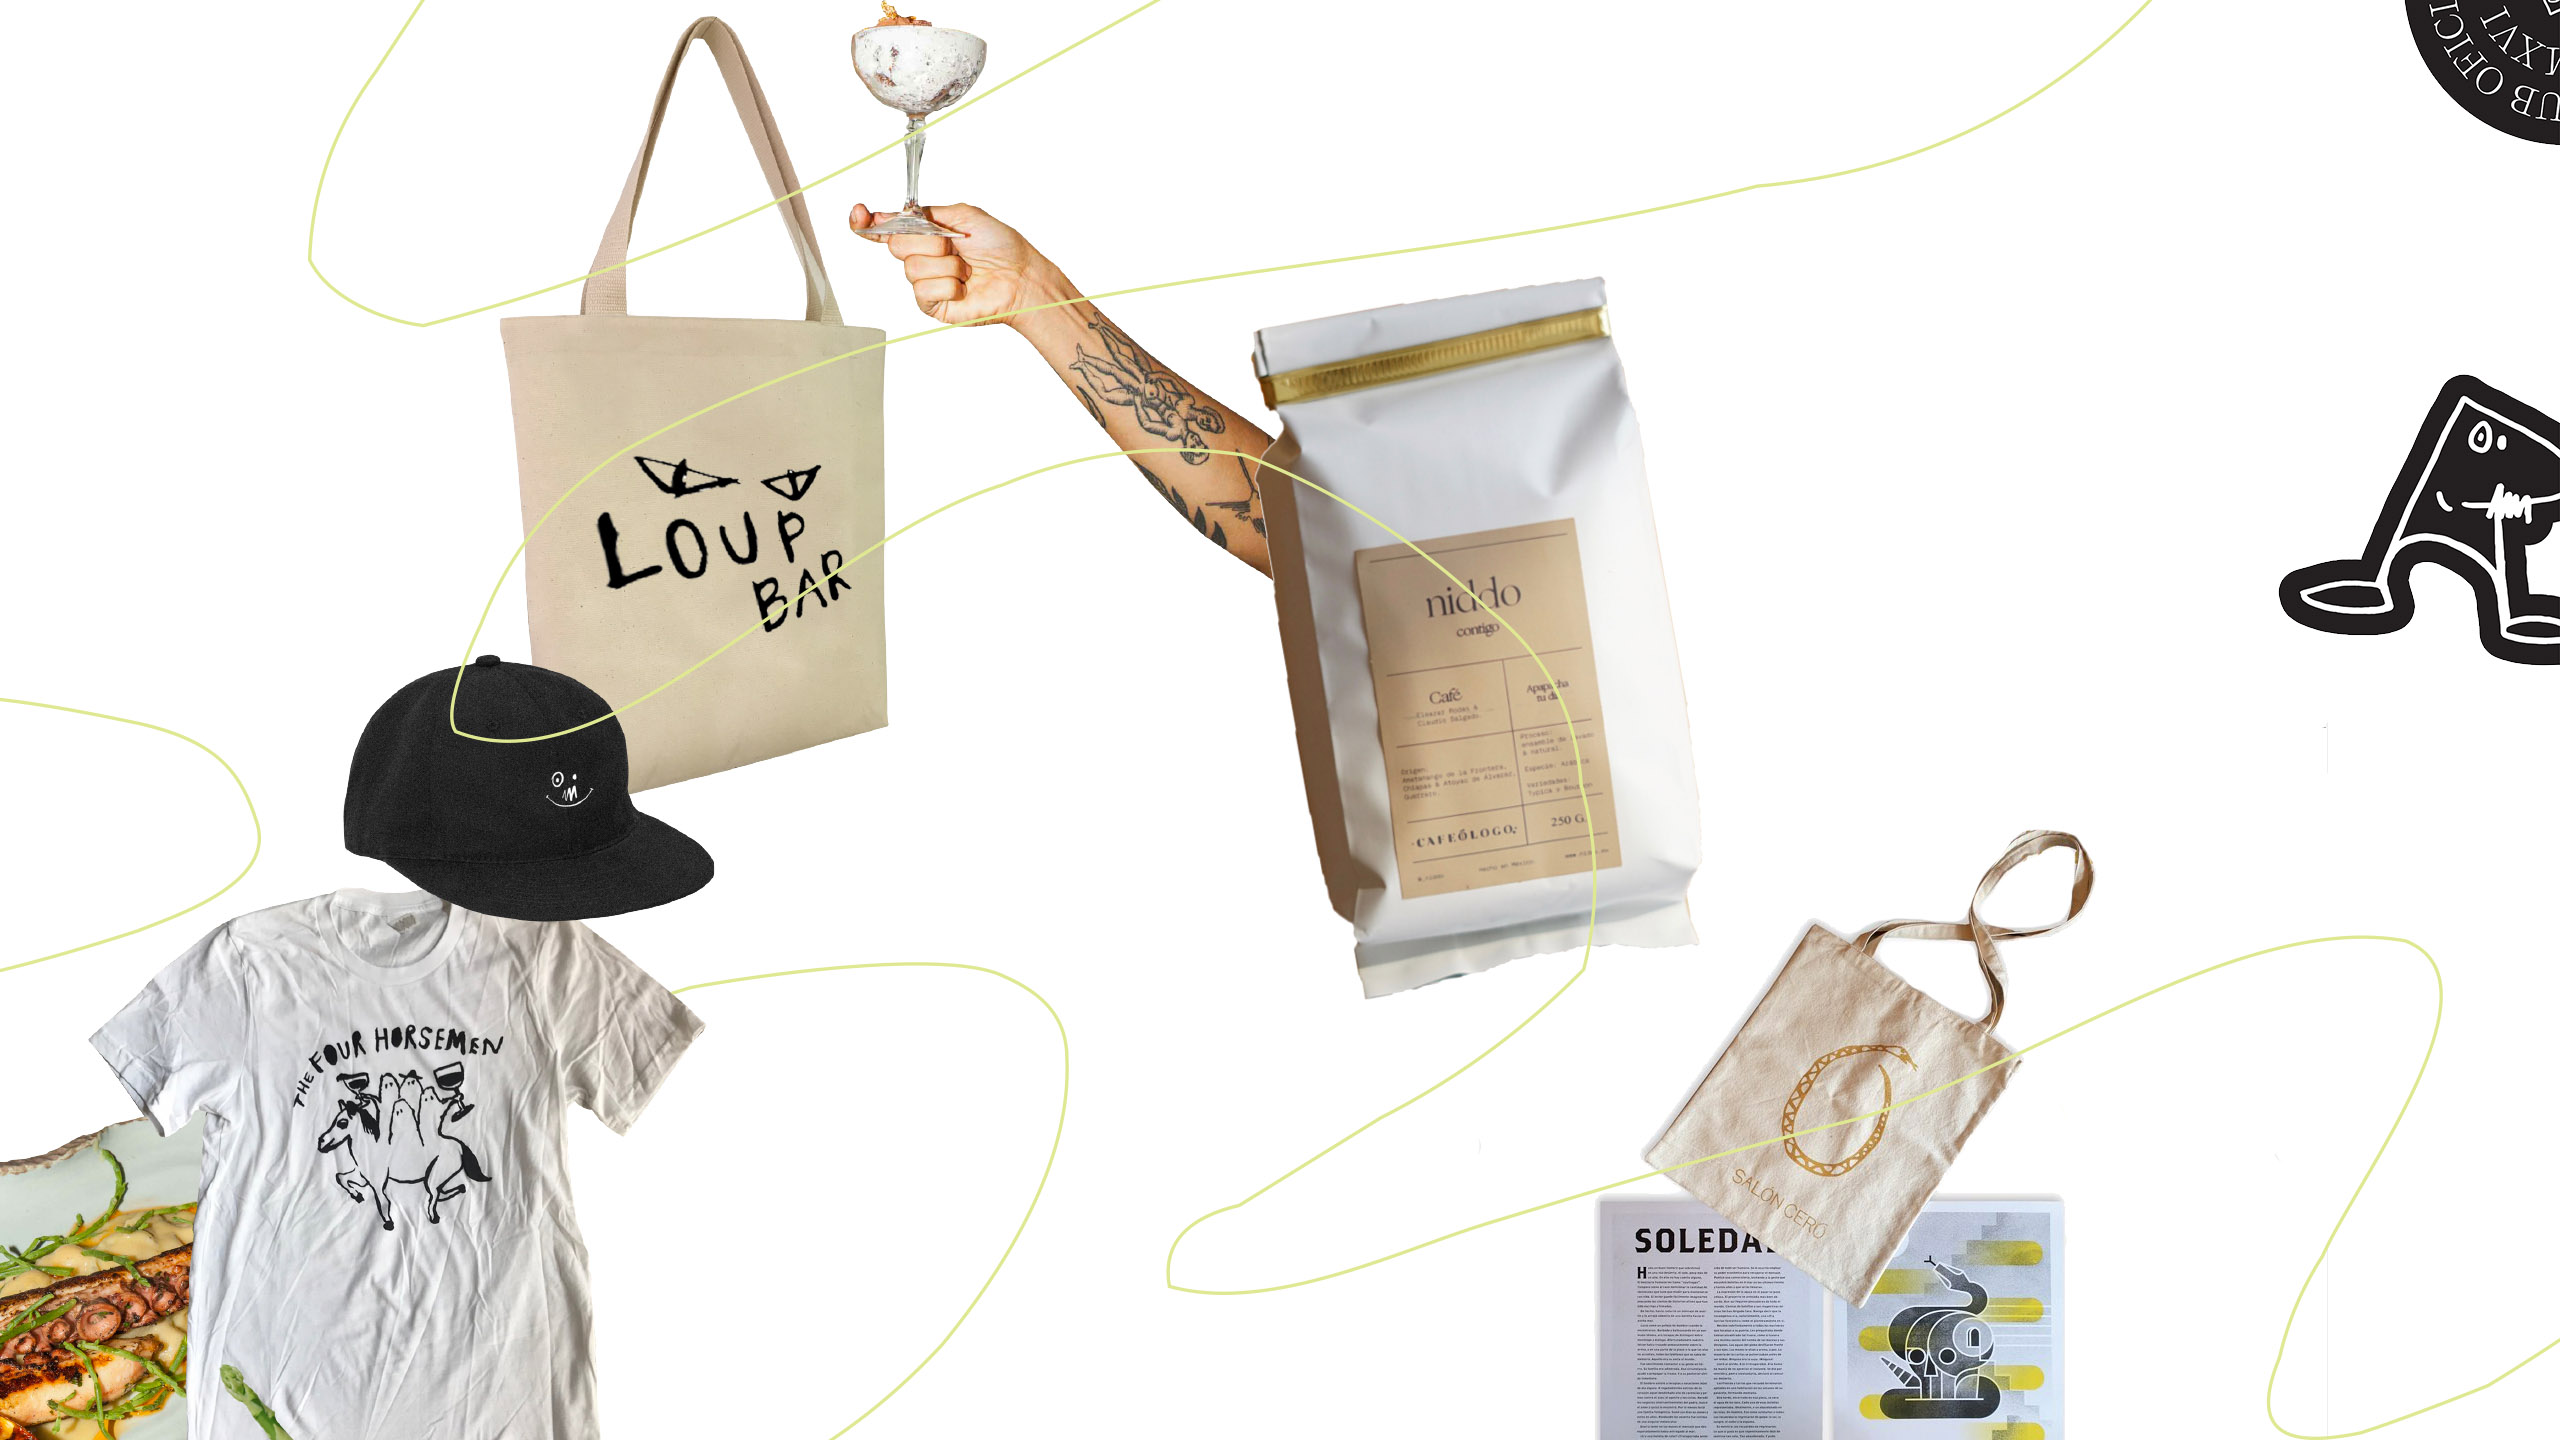 restaurant merchandise, objetos de restaurante